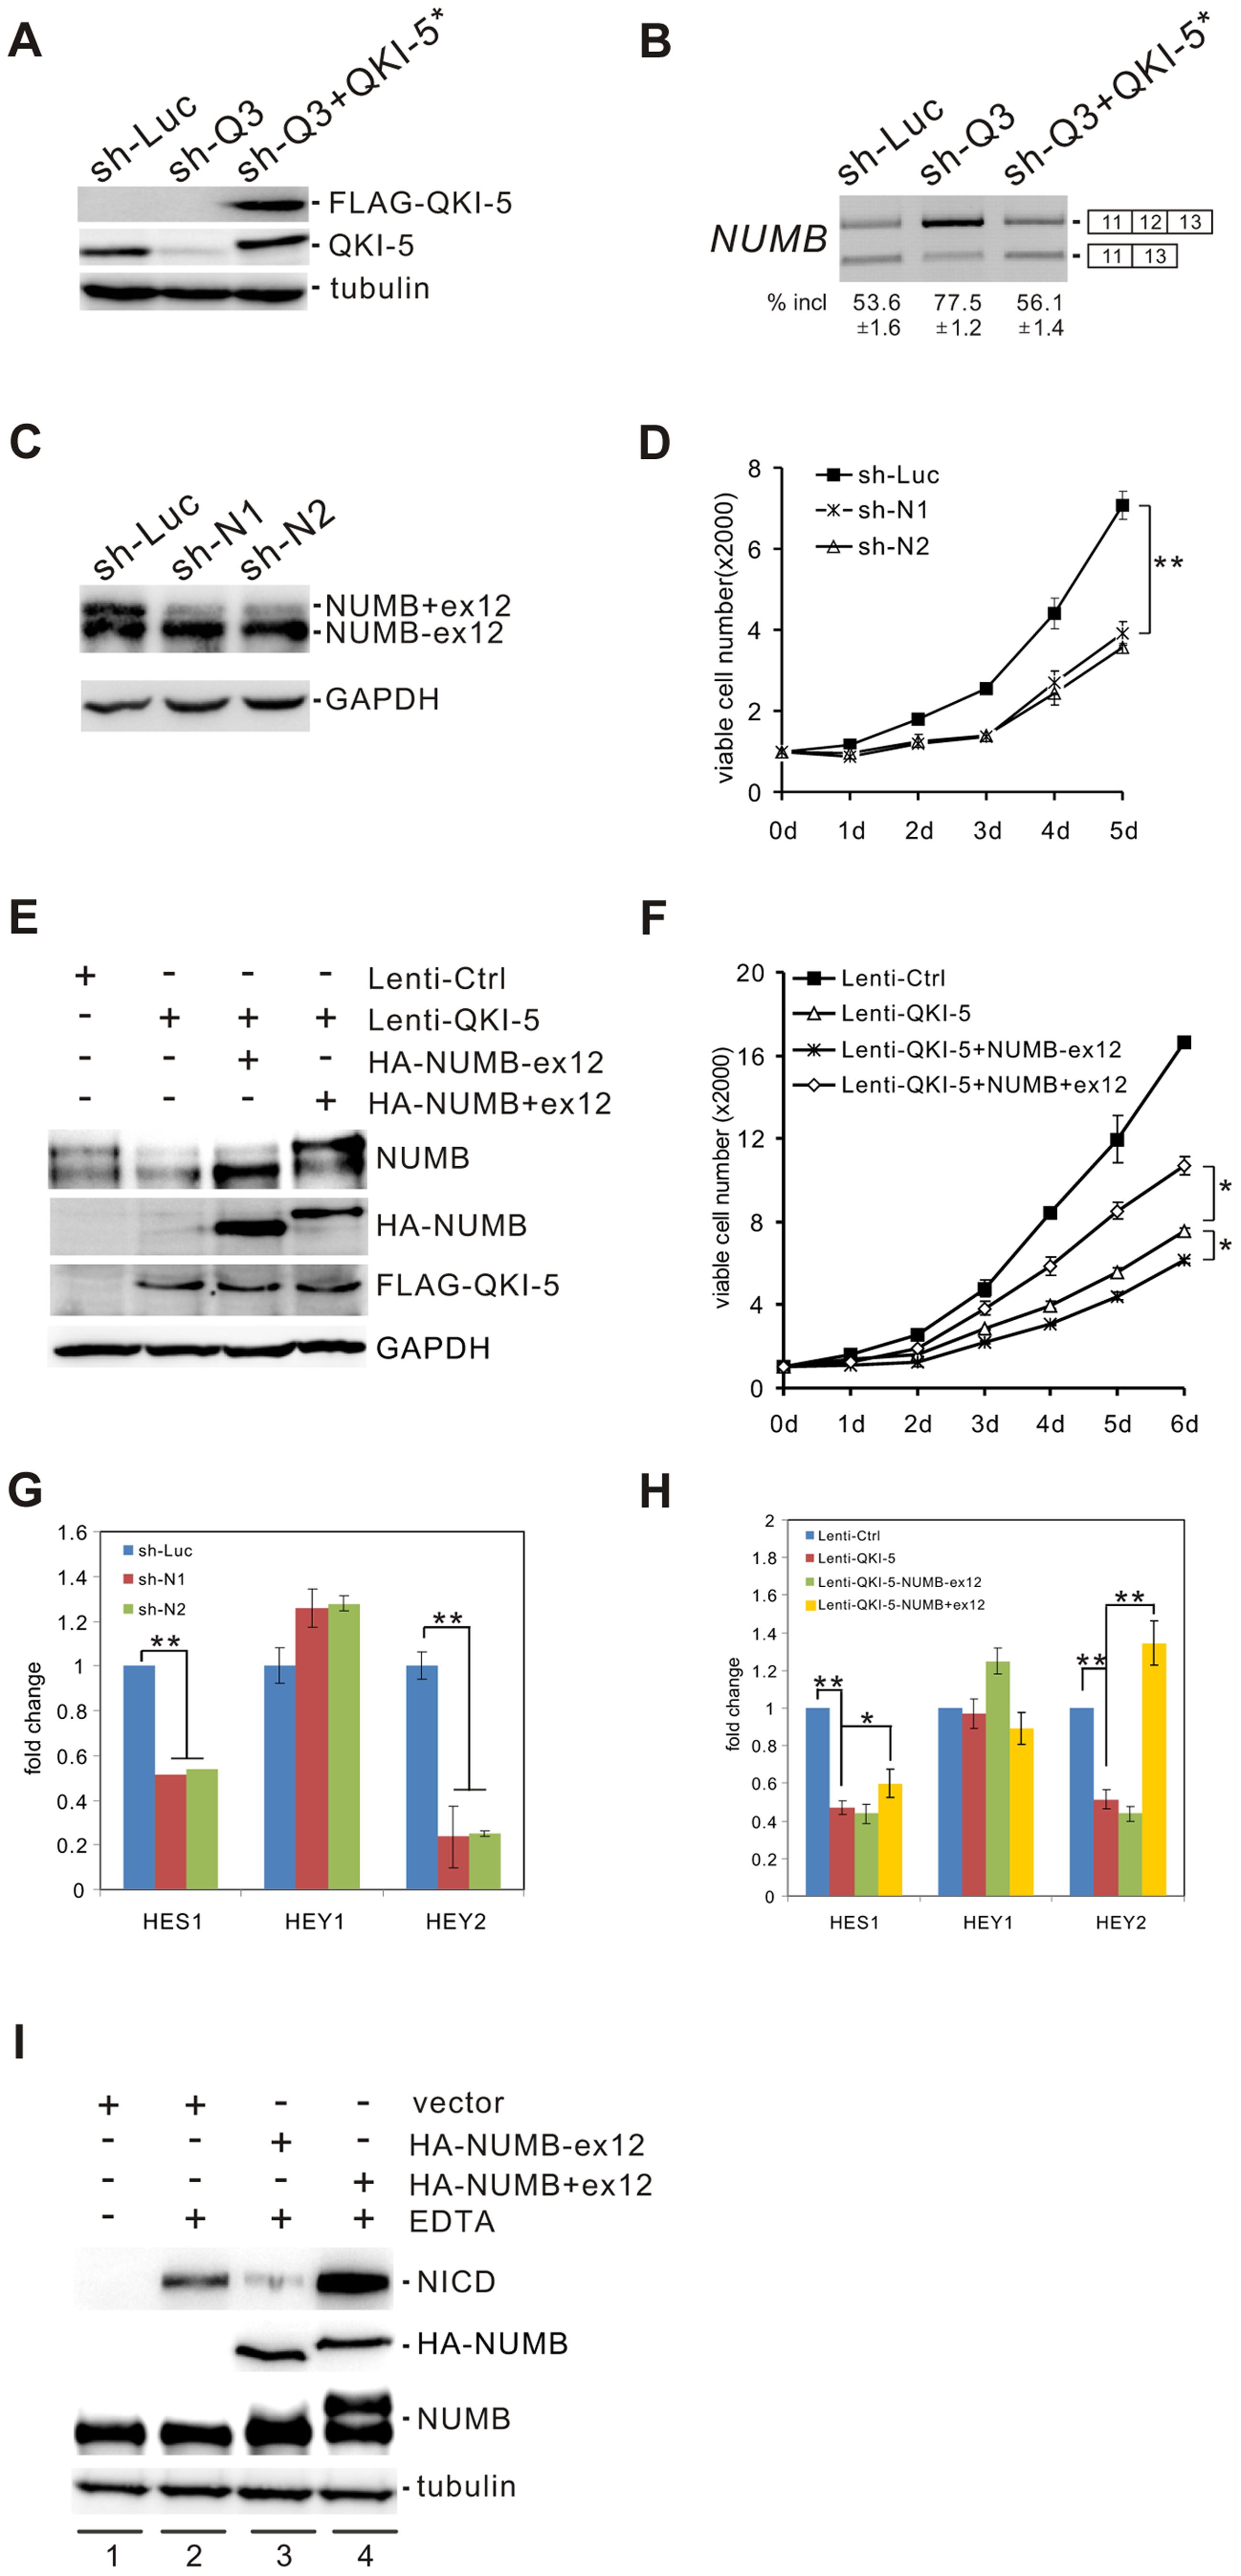 QKI-5 regulates <i>NUMB</i> splicing and the Notch signaling pathway.